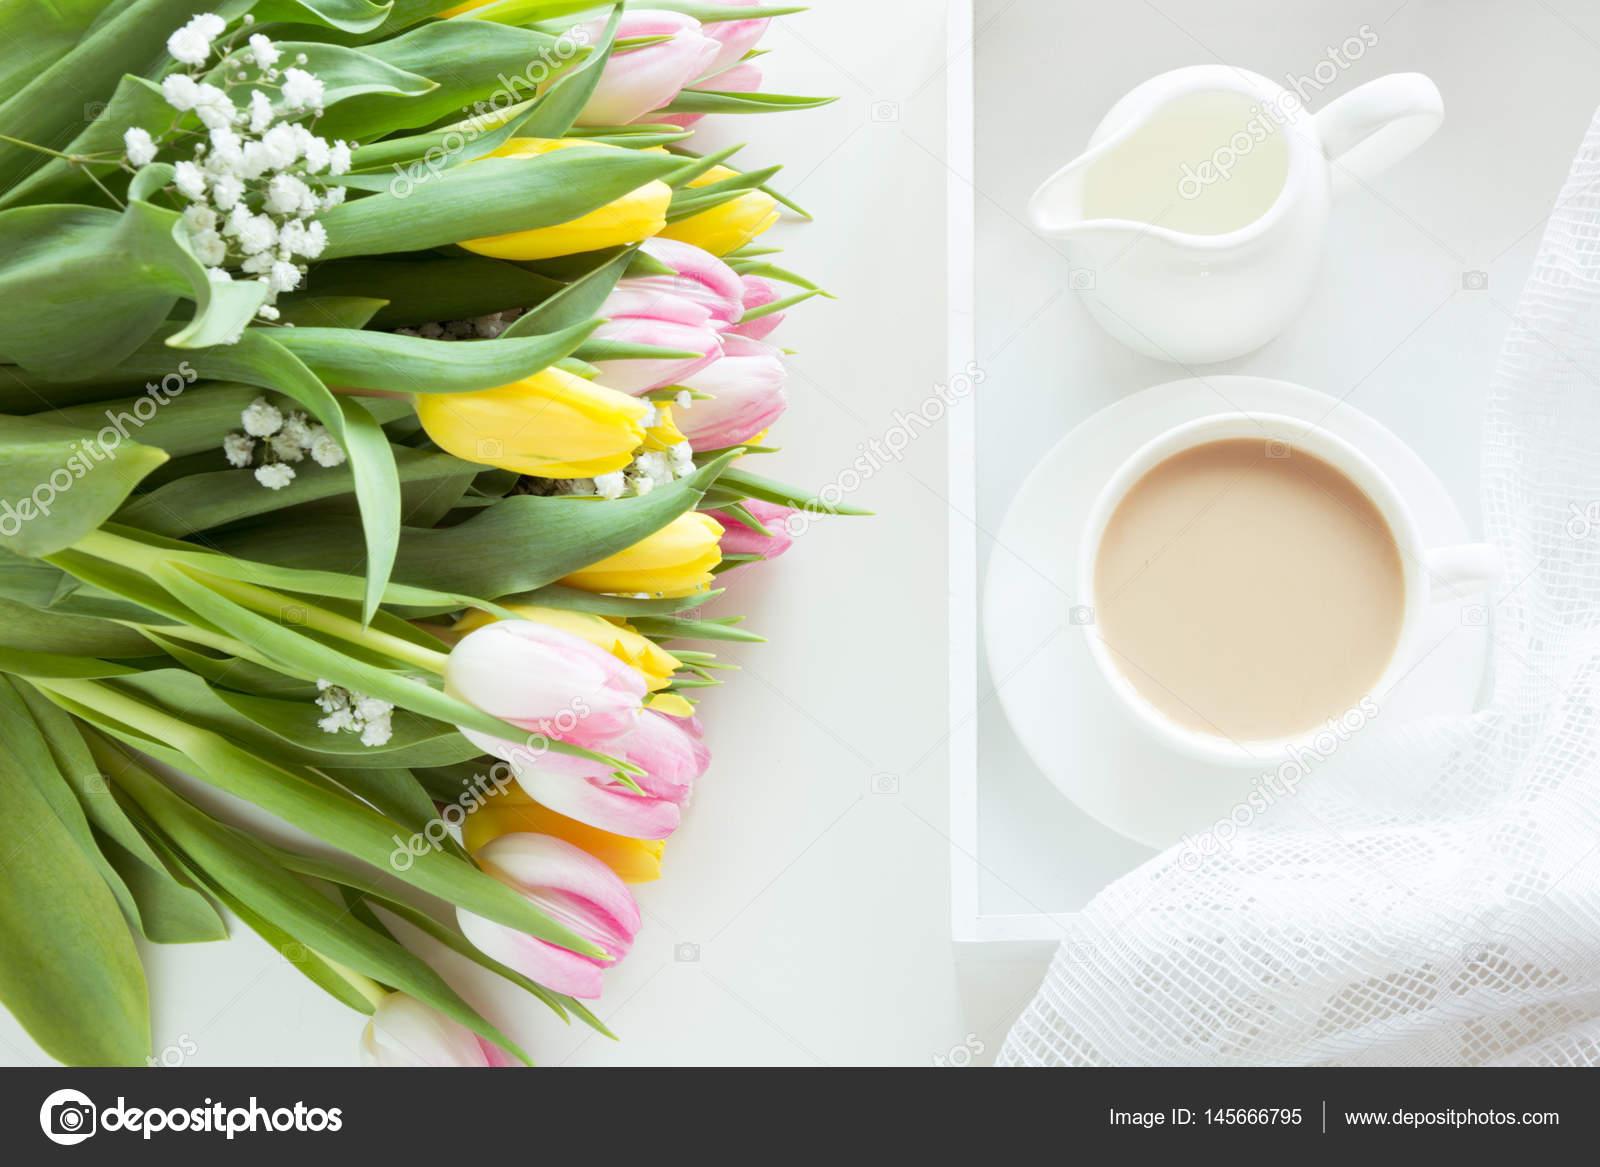 Kahve yerine sarı süt